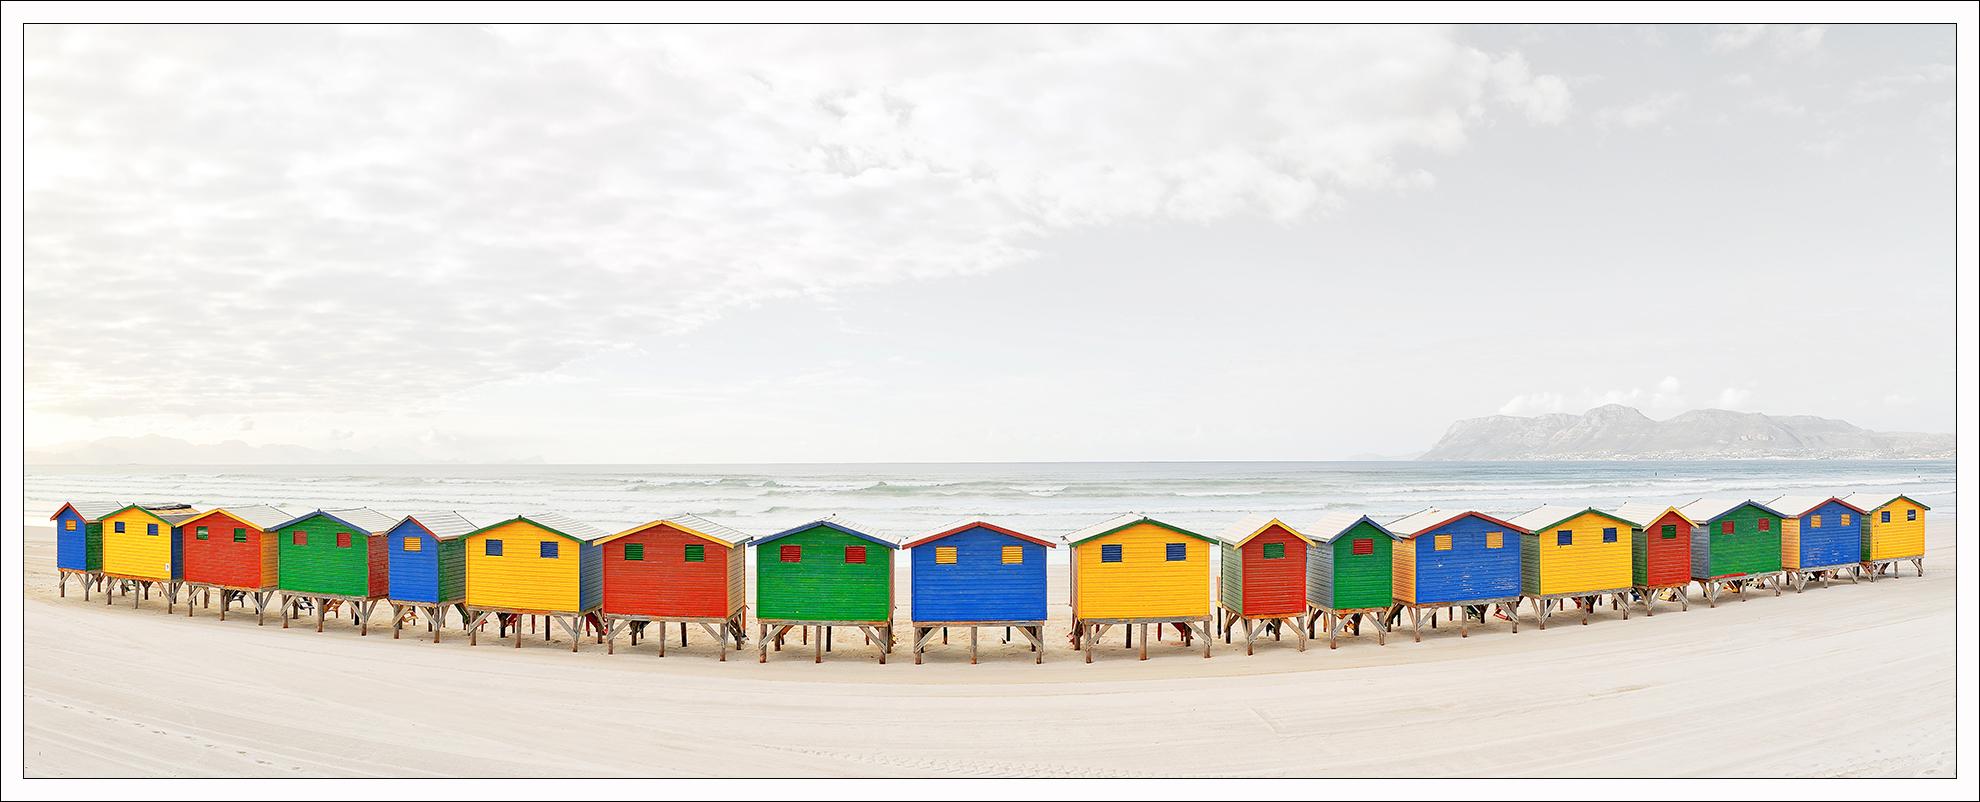 Bunte Strandhäuser *reloaded*